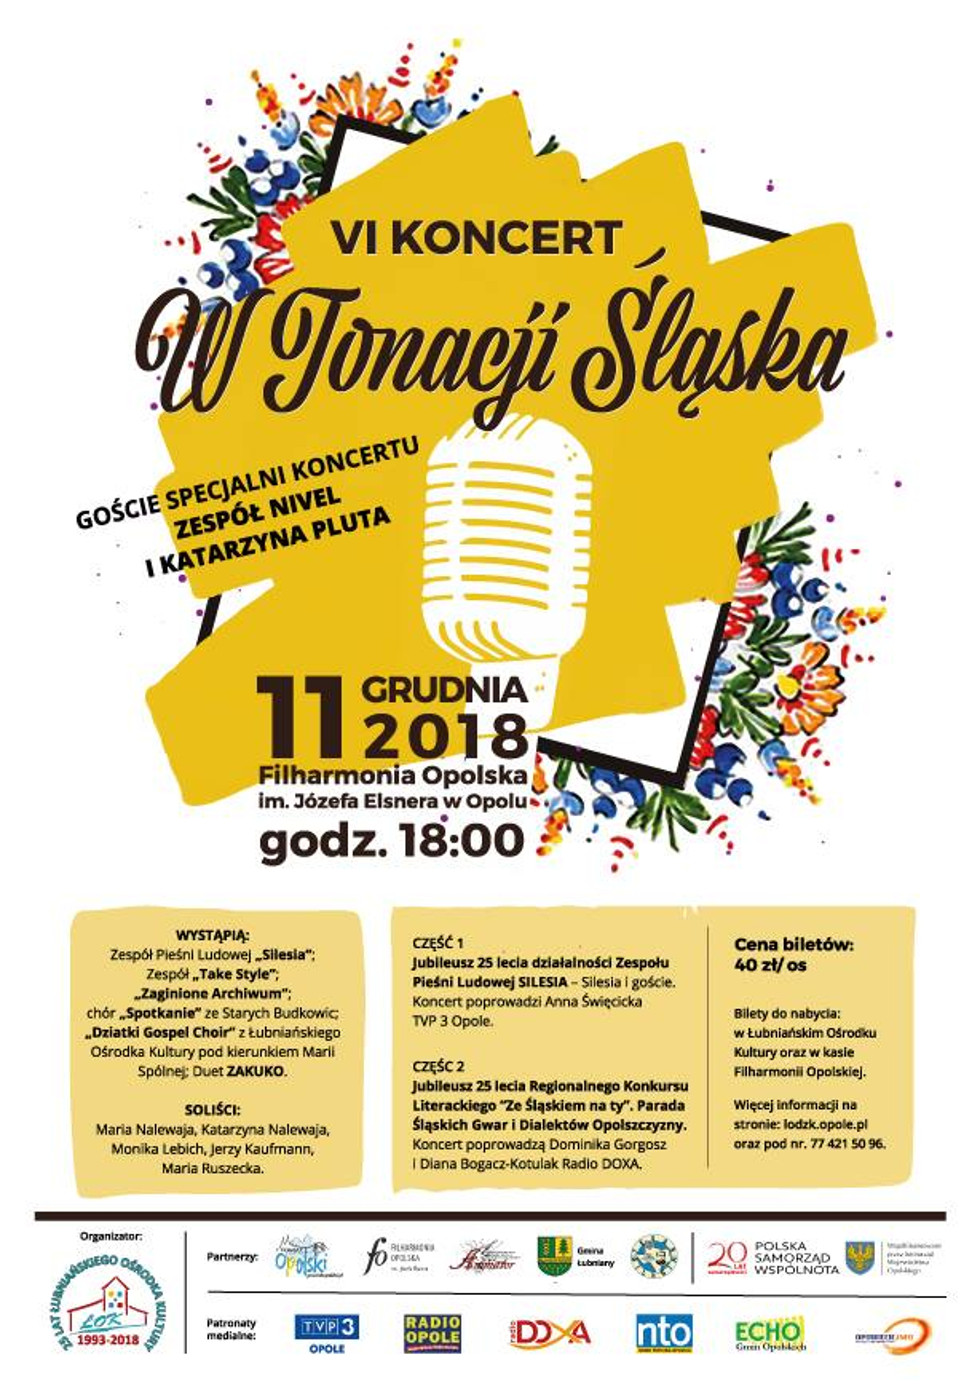 VI-Koncert-W-Tonacji-Śląska